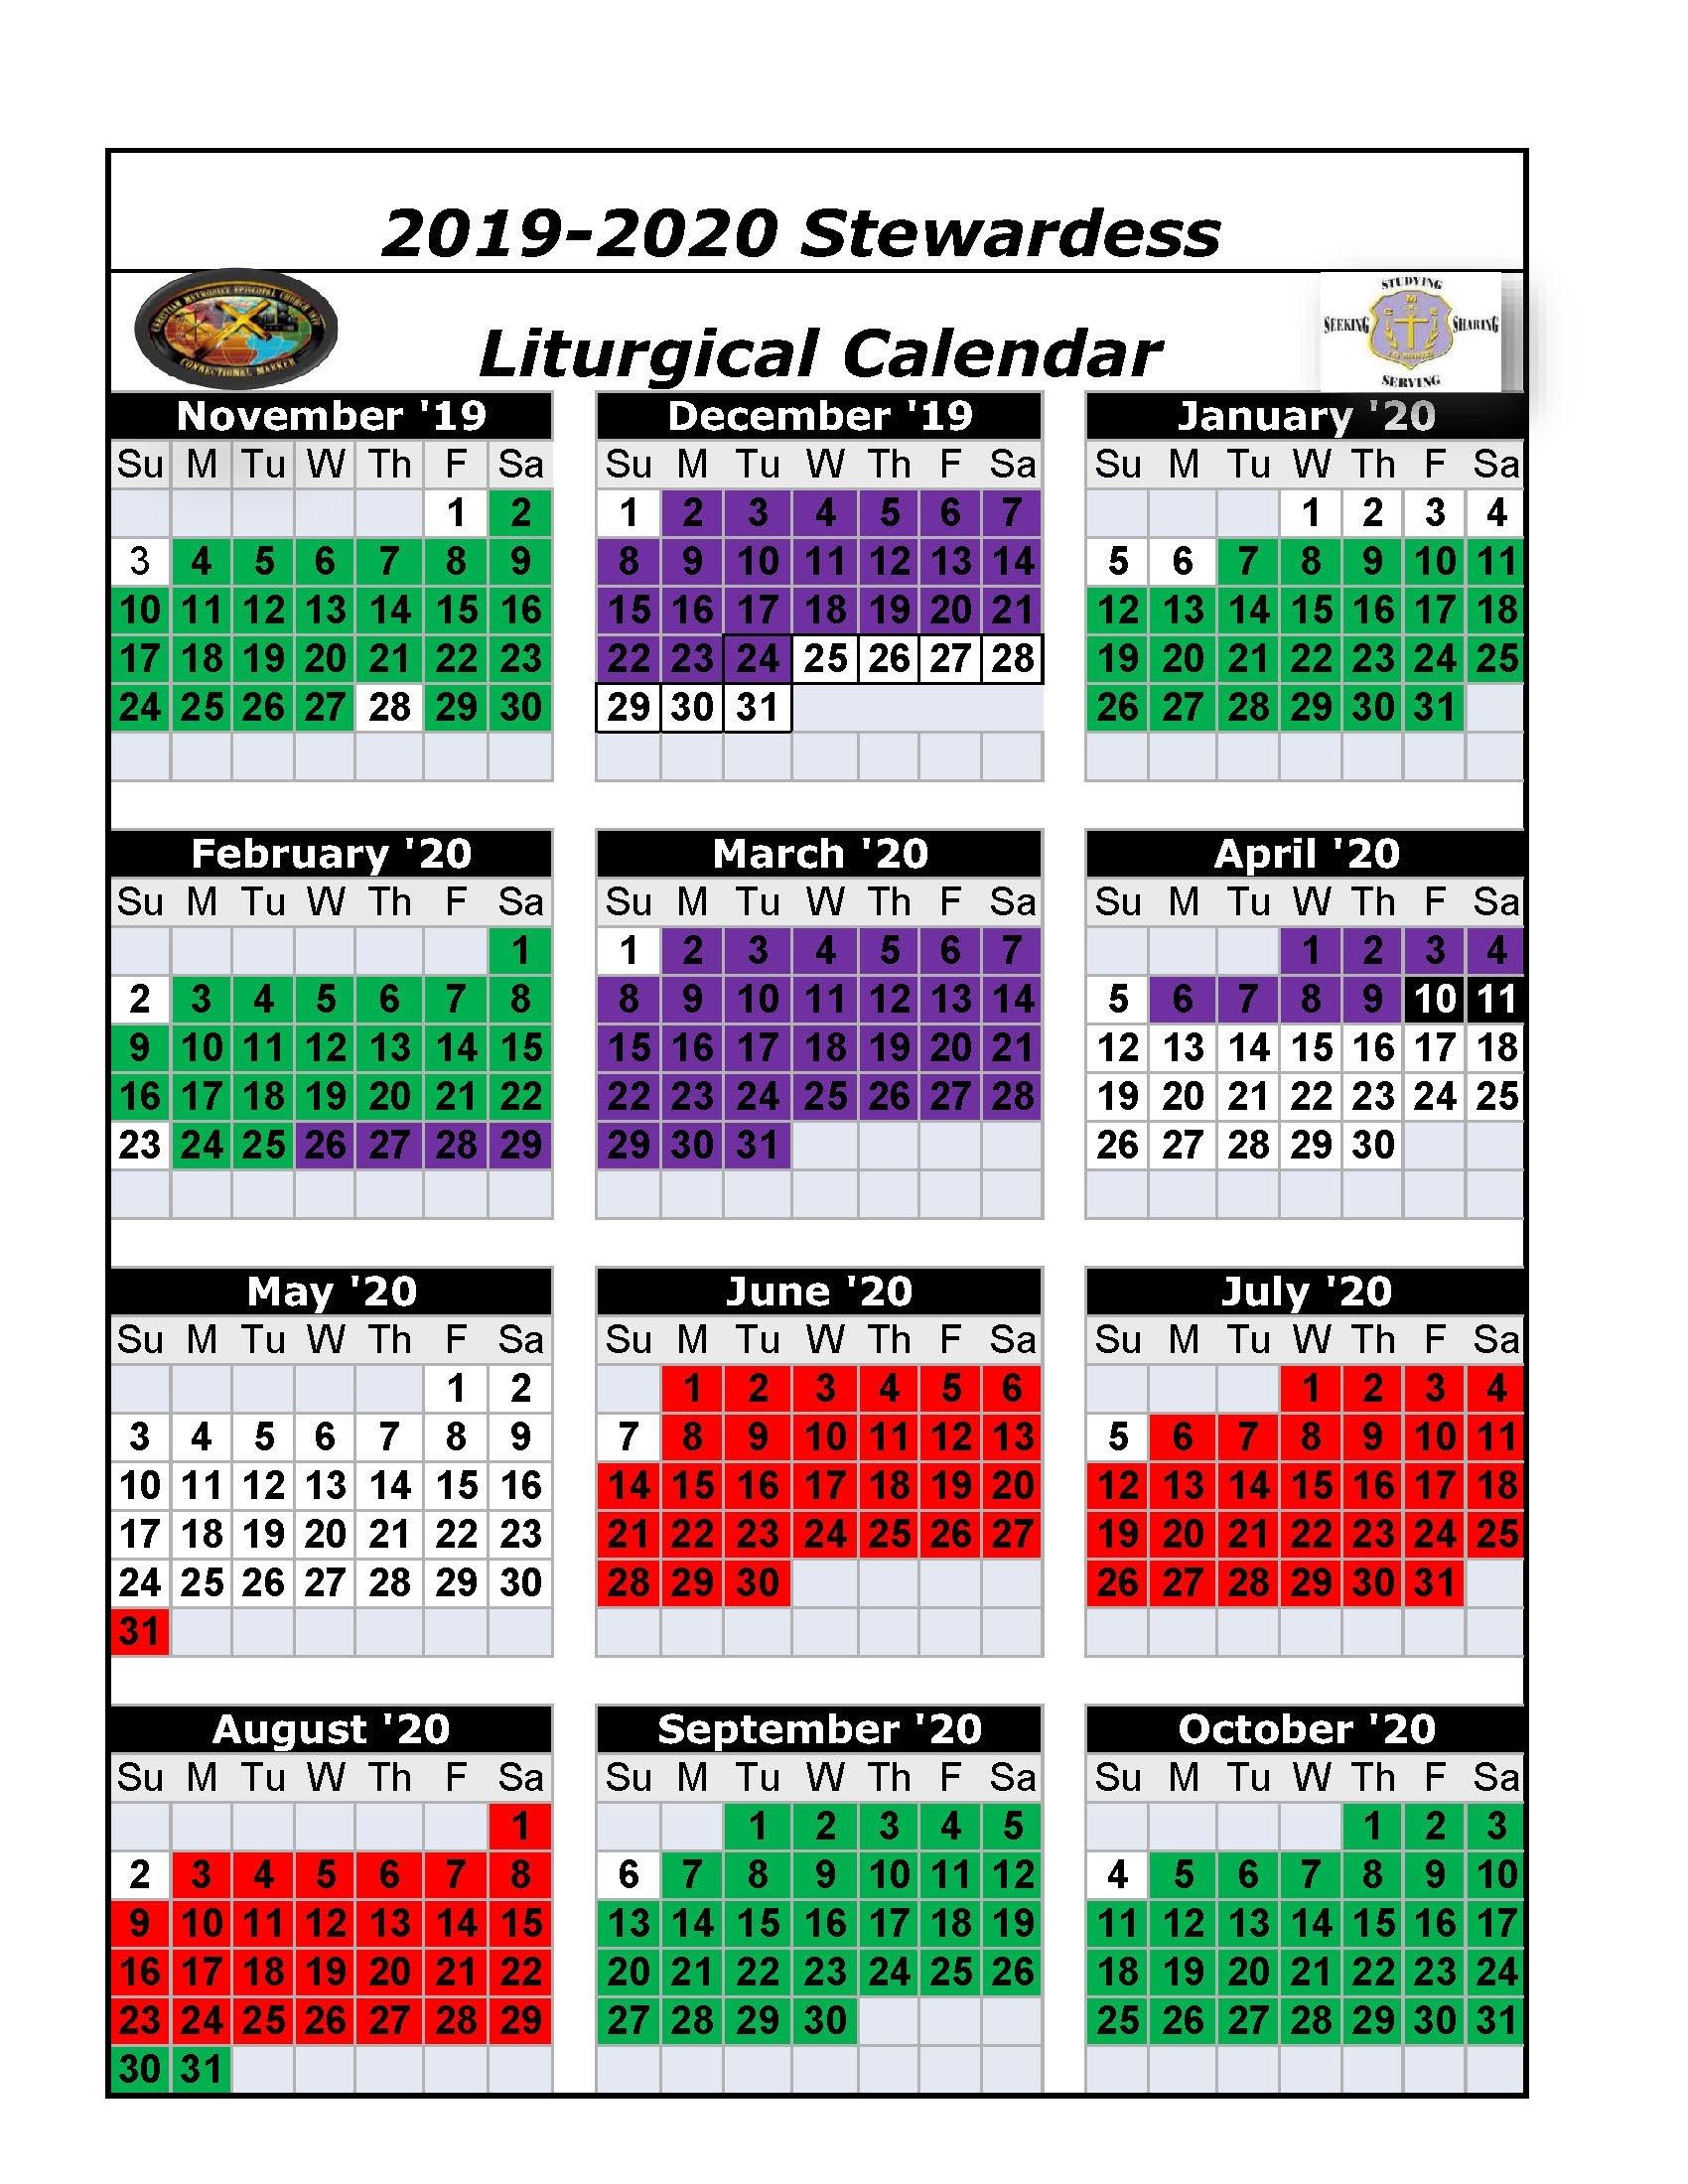 2020 United Methodist Liturgical Calendar - Template  United Methodist Church Lectionary Preaching 2021